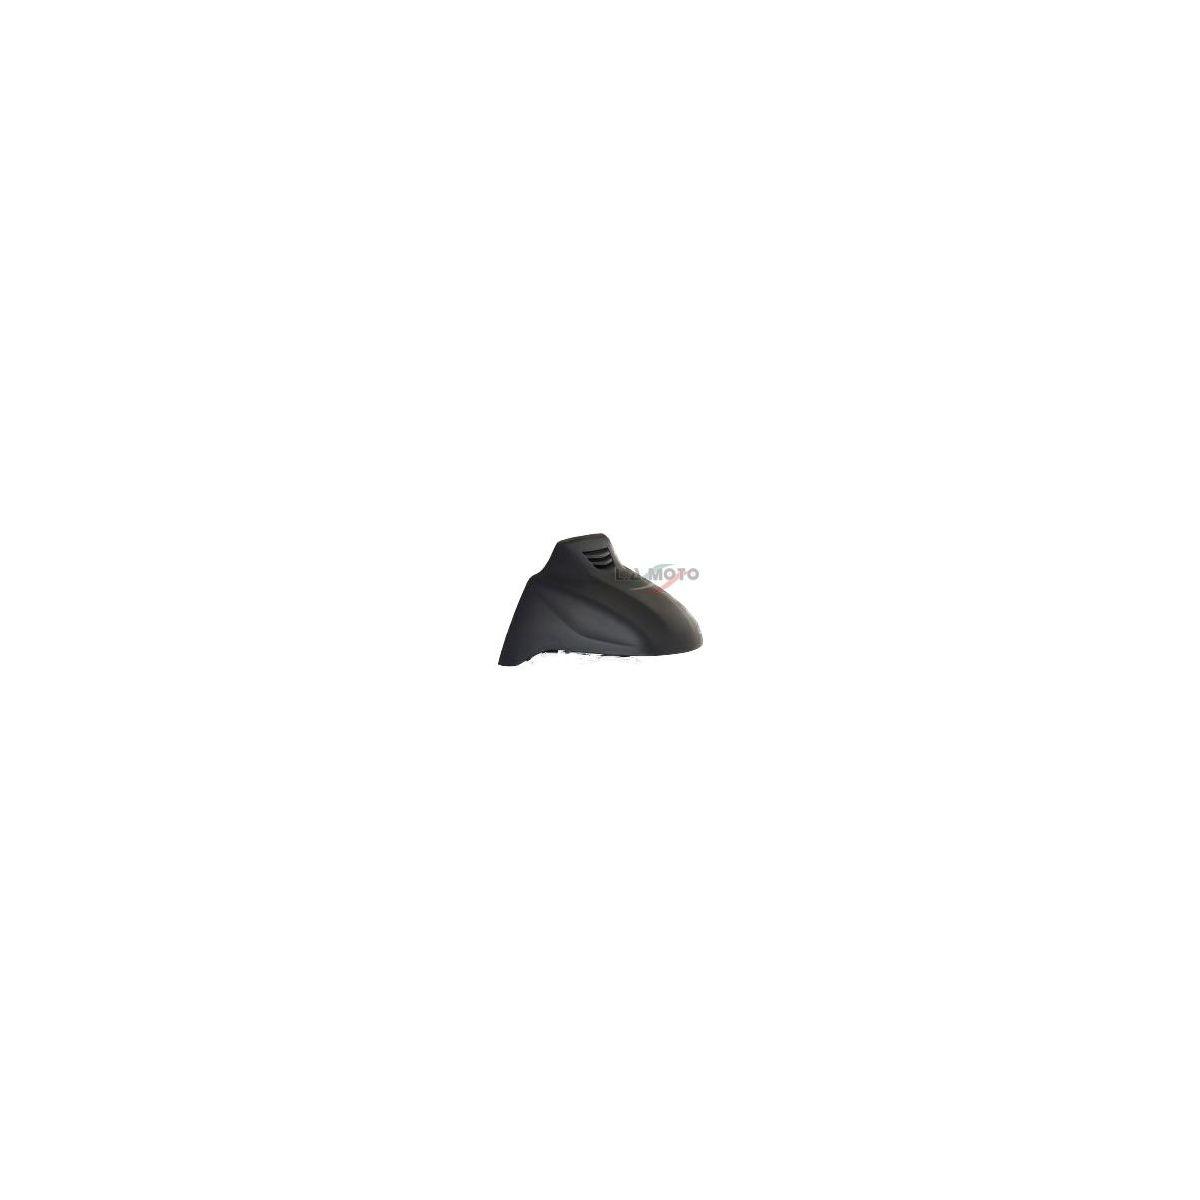 PARAFANGO ANTERIORE cod. B075974